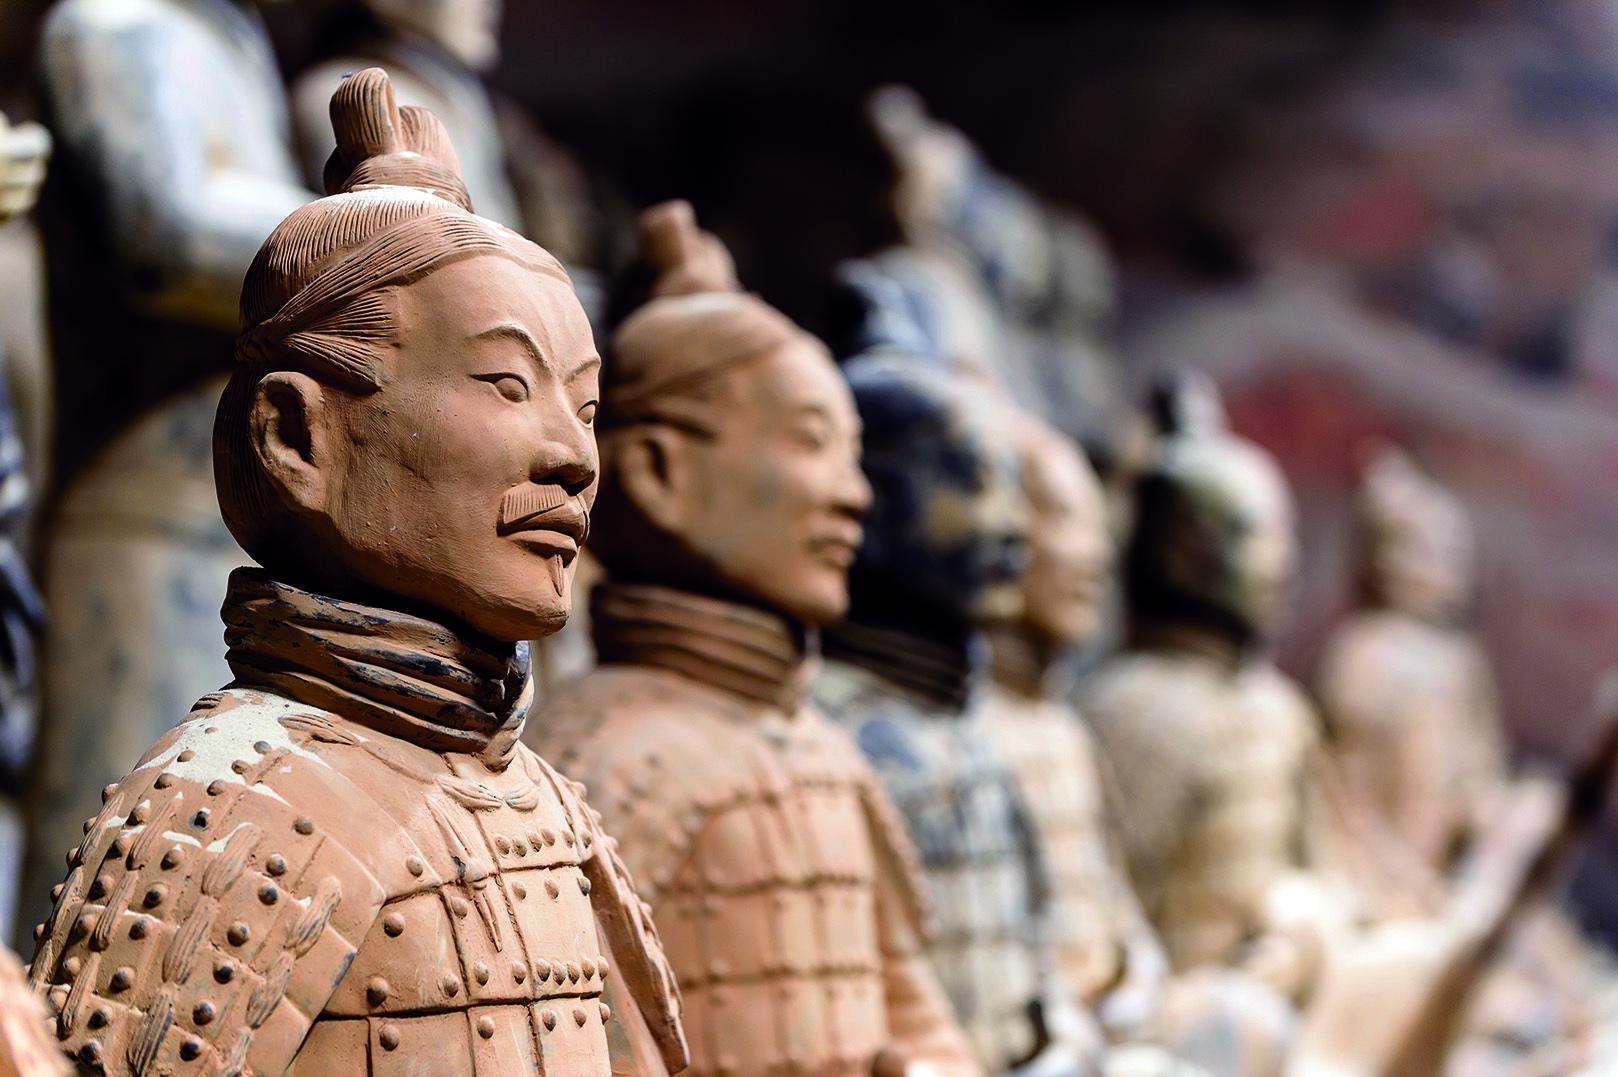 Chinas berühmte Terrakotta-Armee erobert das Technikum in Mühlheim an der Ruhr